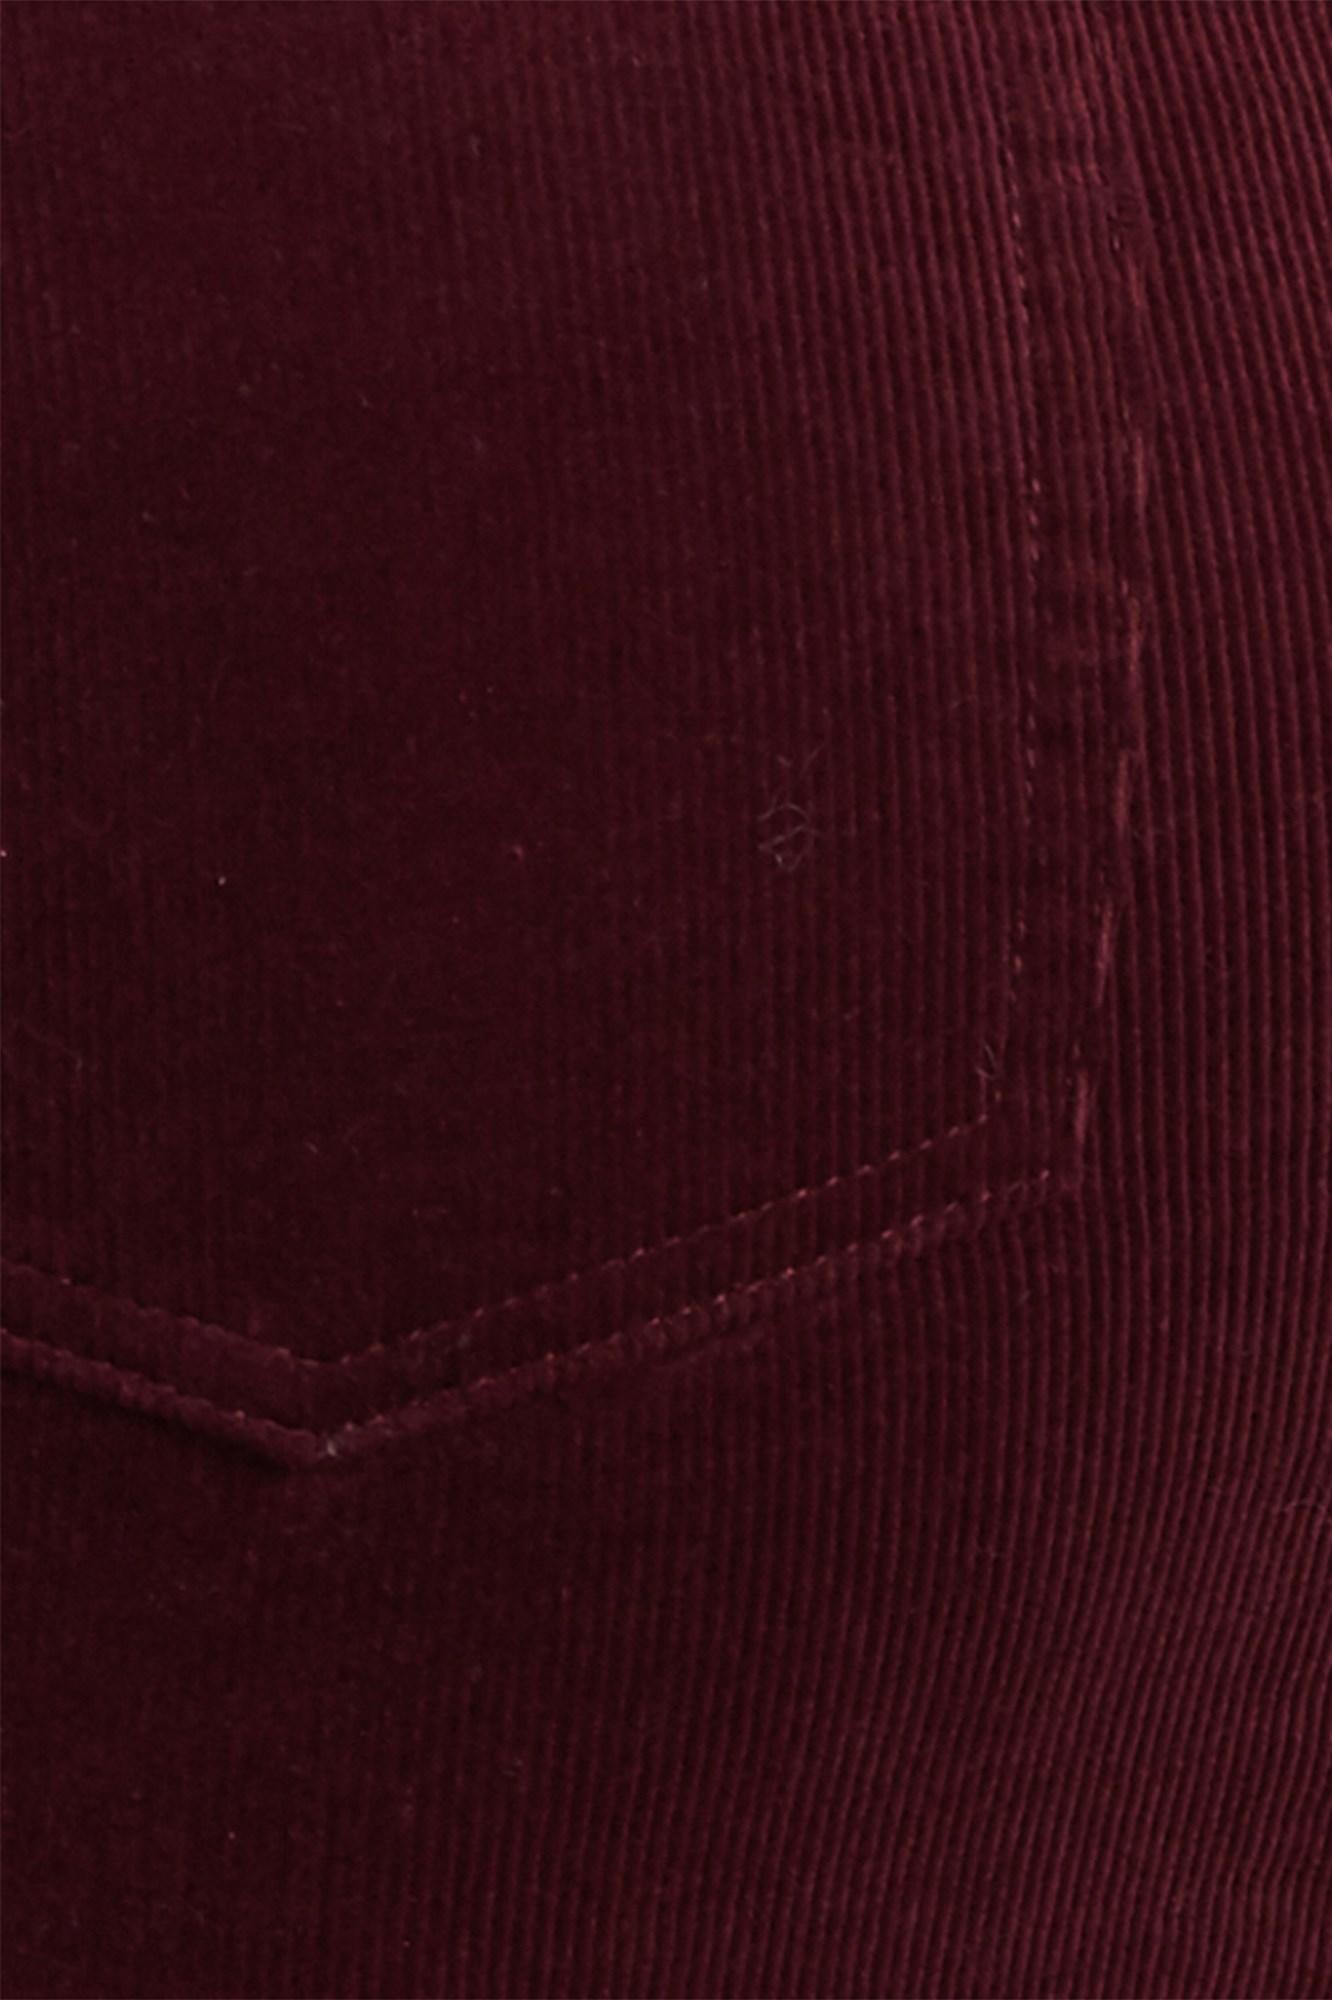 Image 5 of High Rise Corduroy Skirt